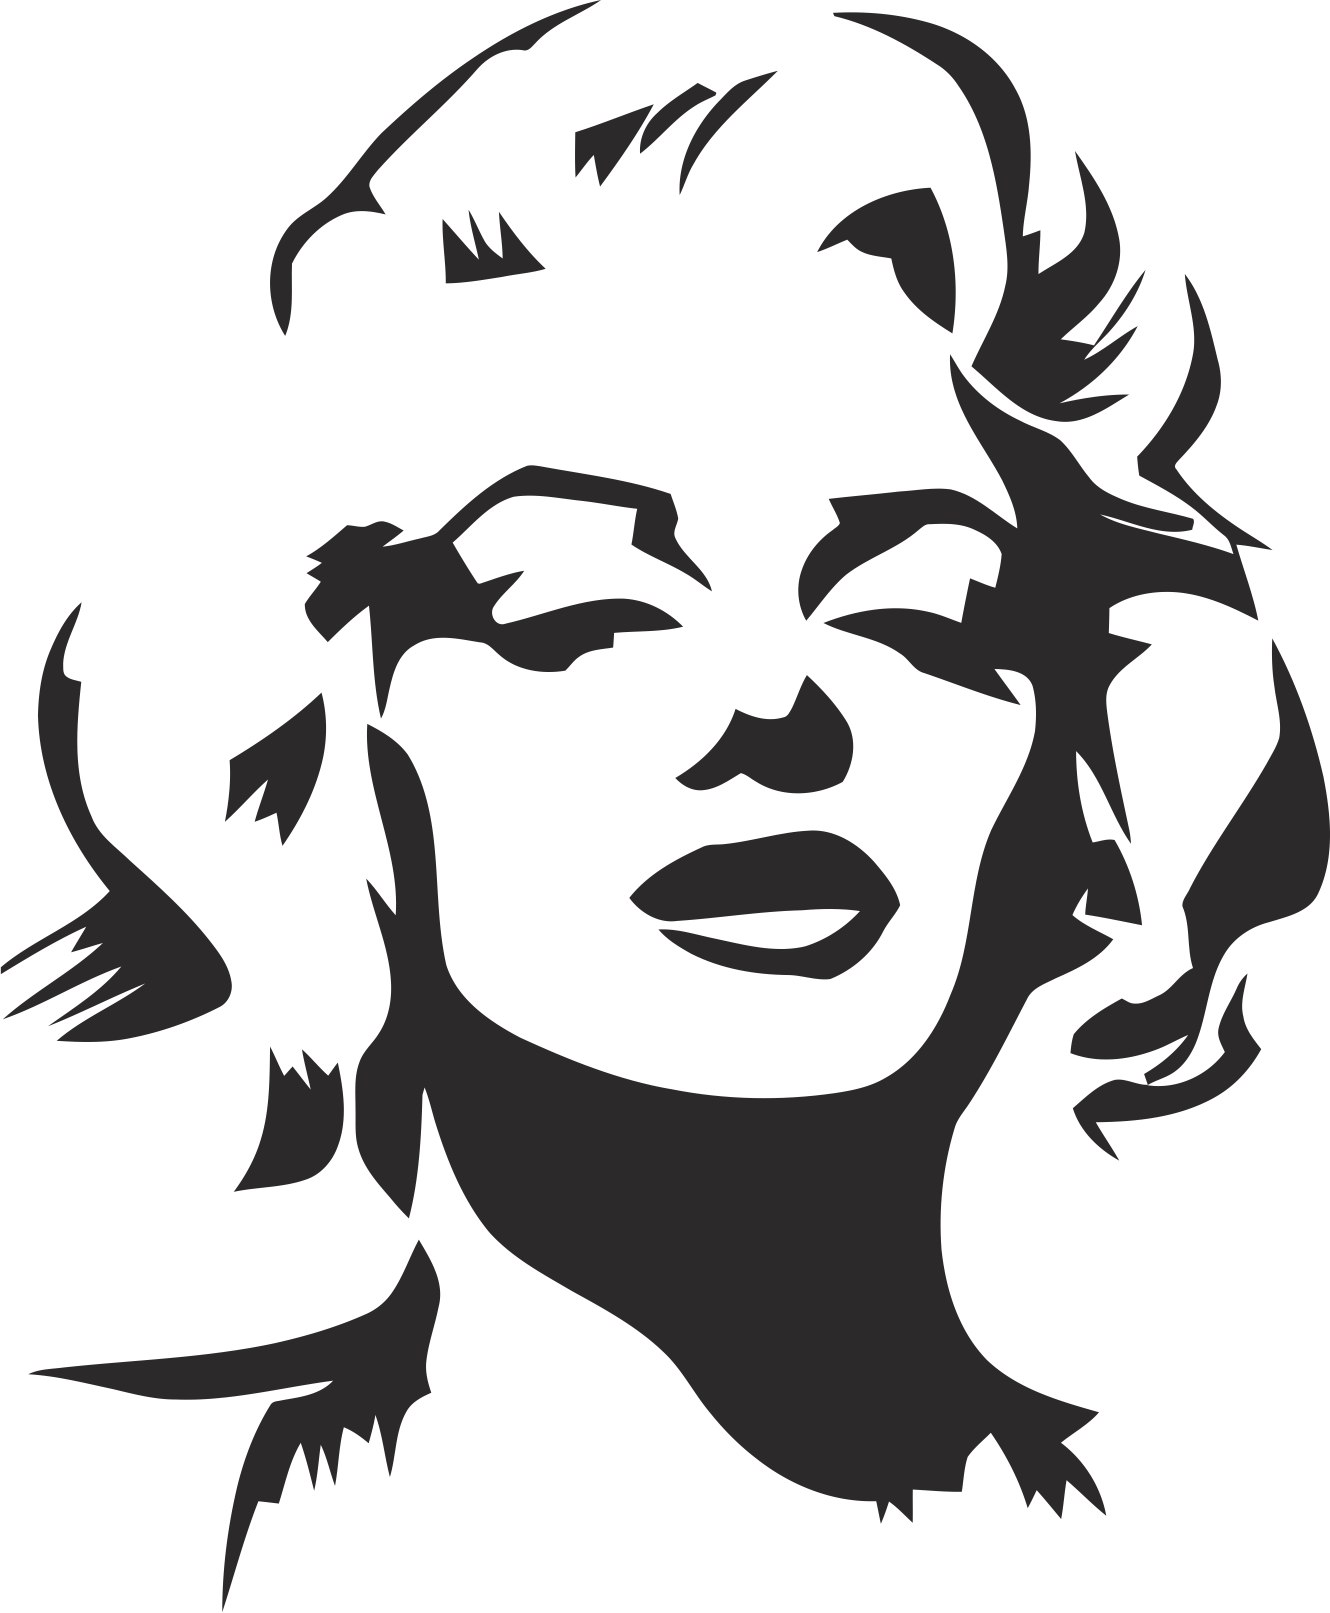 Marilyn Monroe Stencil Free Vector